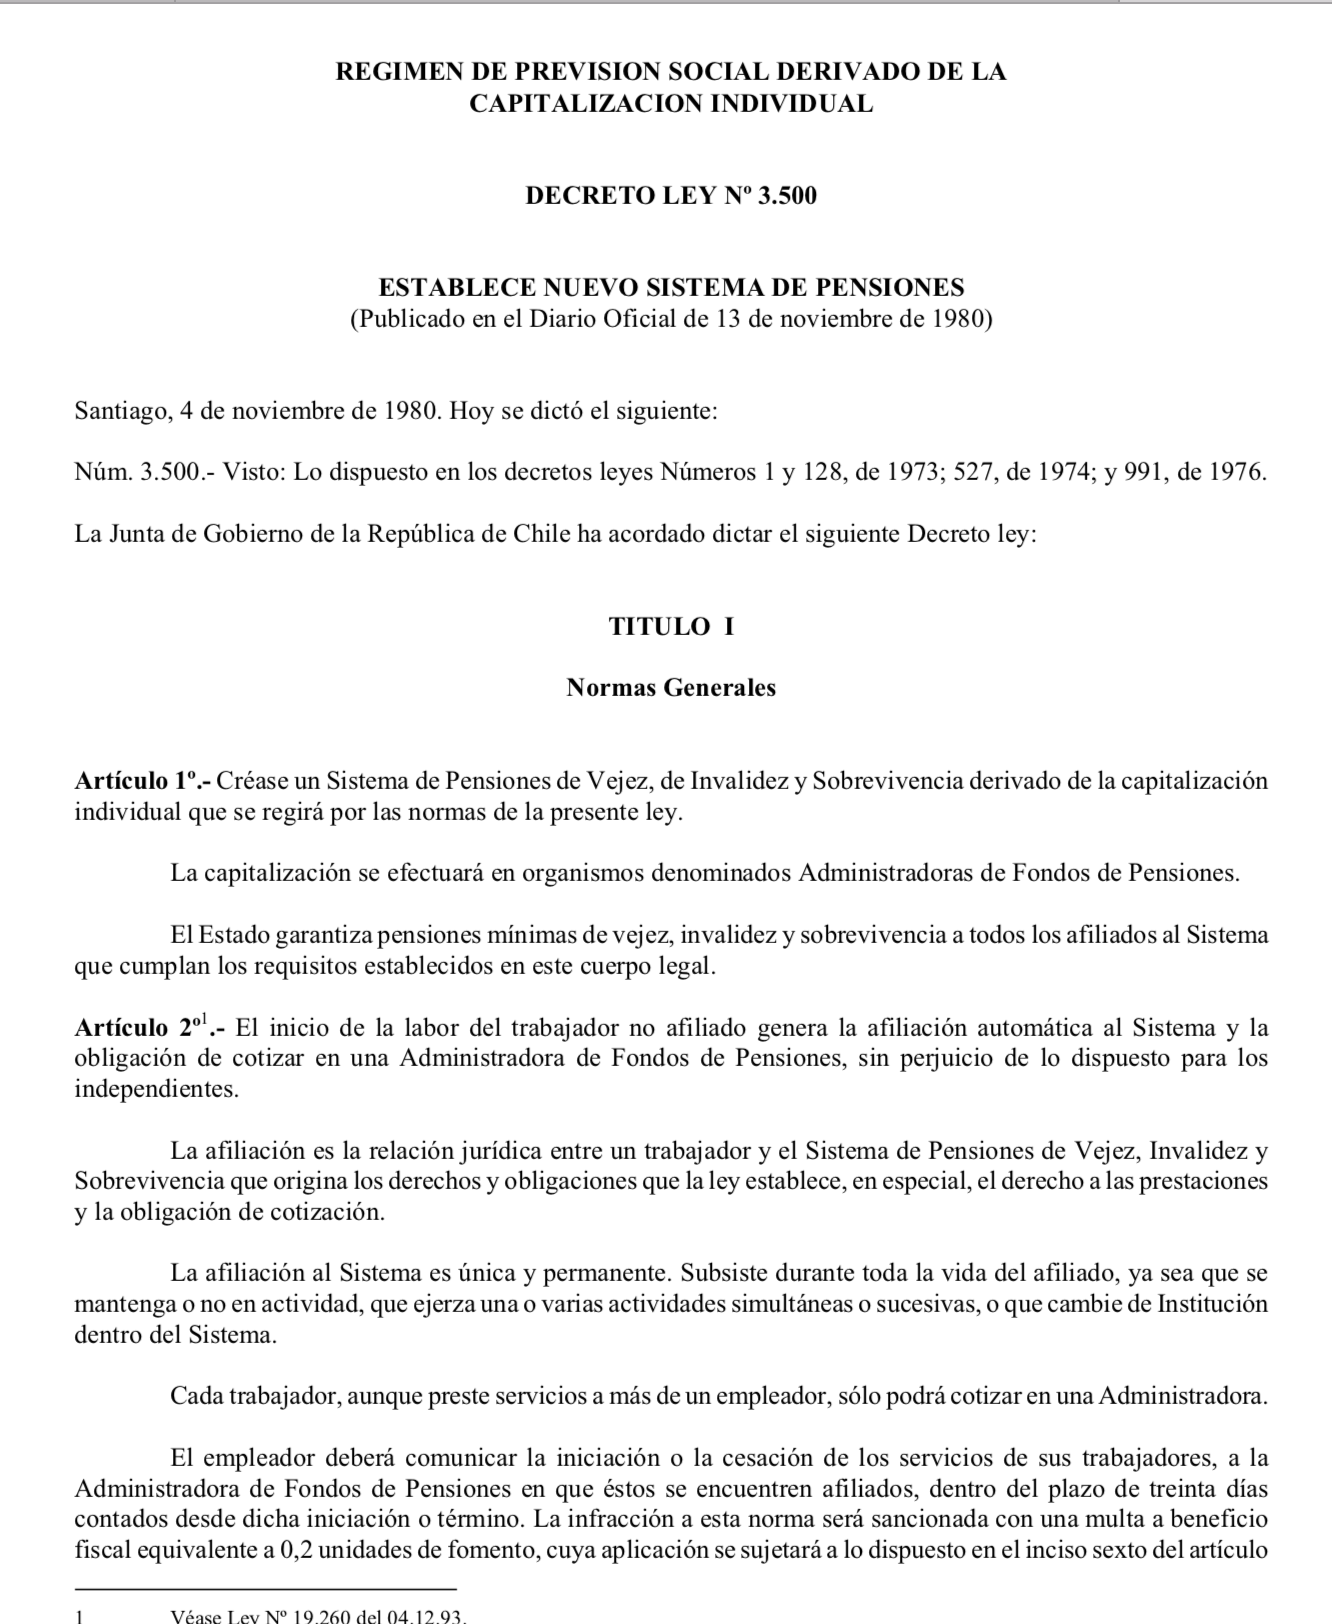 Decreto Ley 3.500